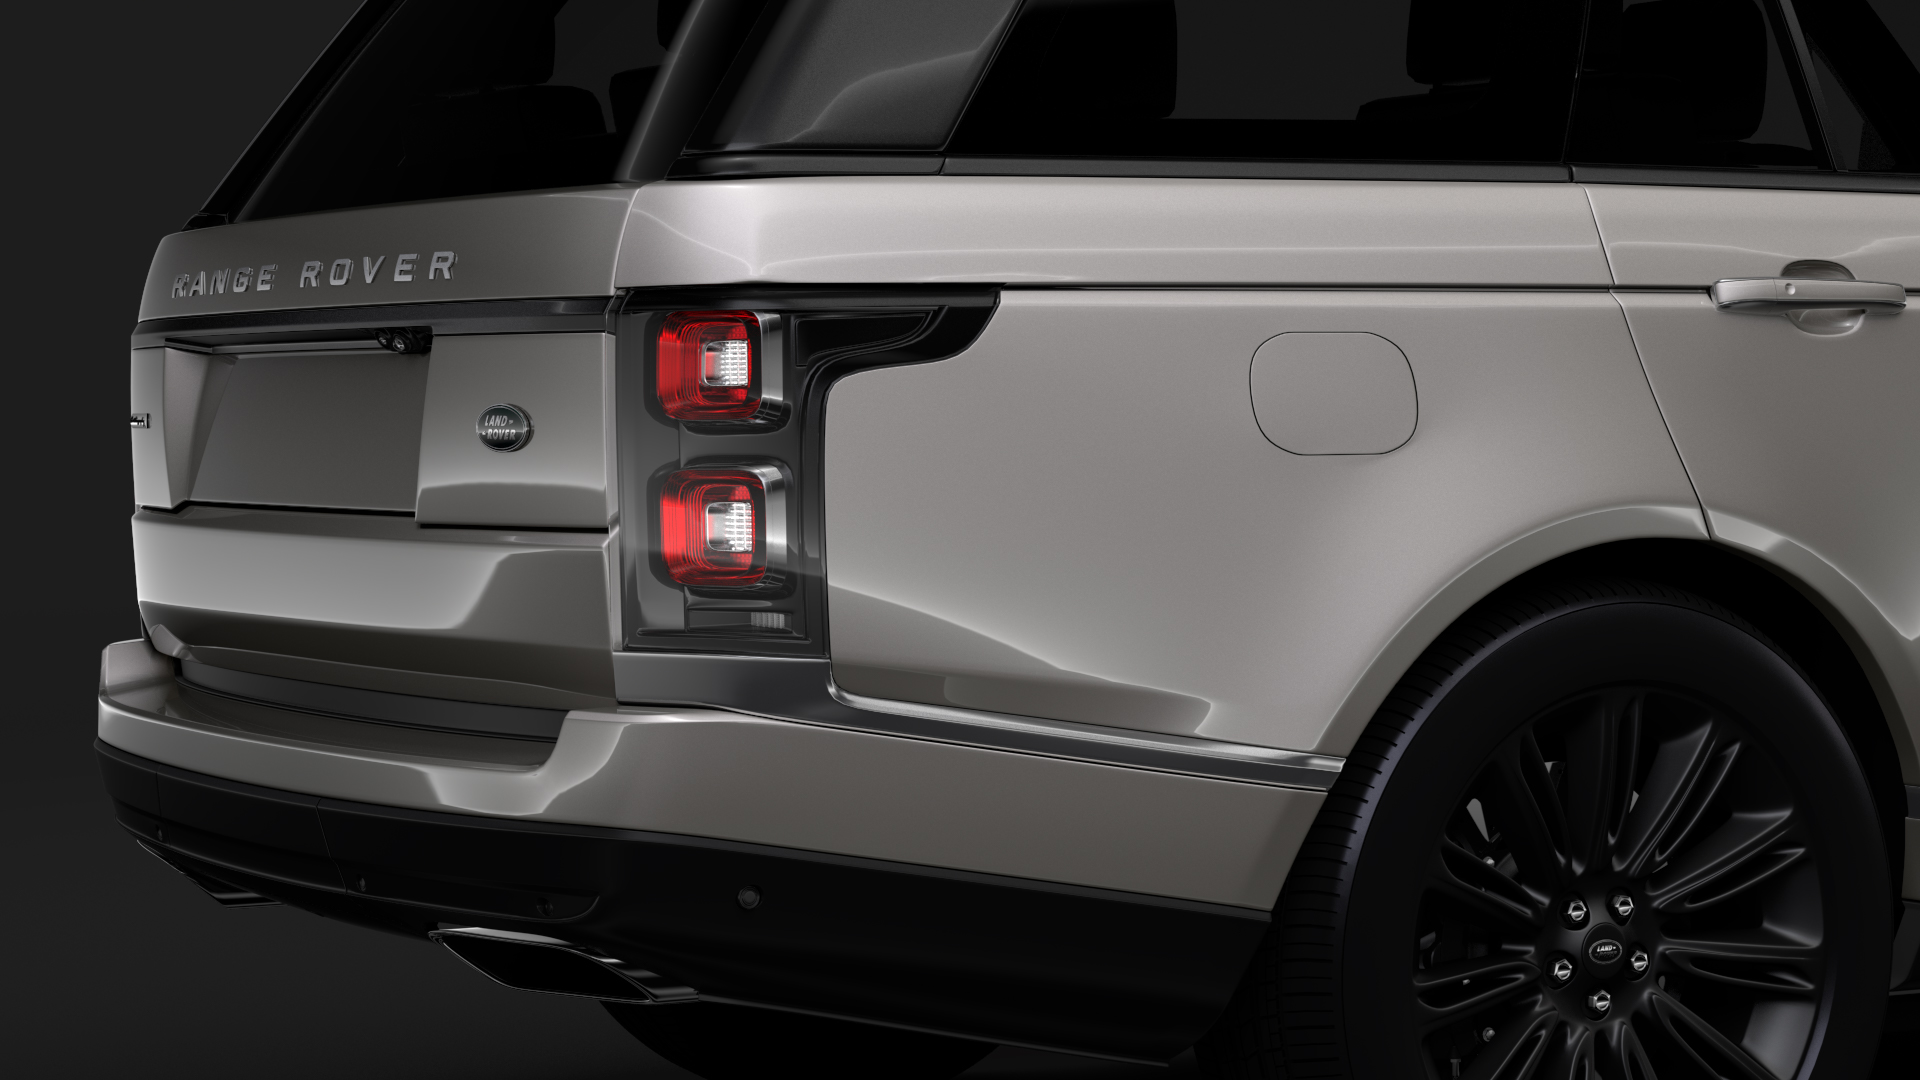 range rover autobiography hybrid lwb l405 2018 3d model max fbx c4d lwo ma mb hrc xsi obj 277299